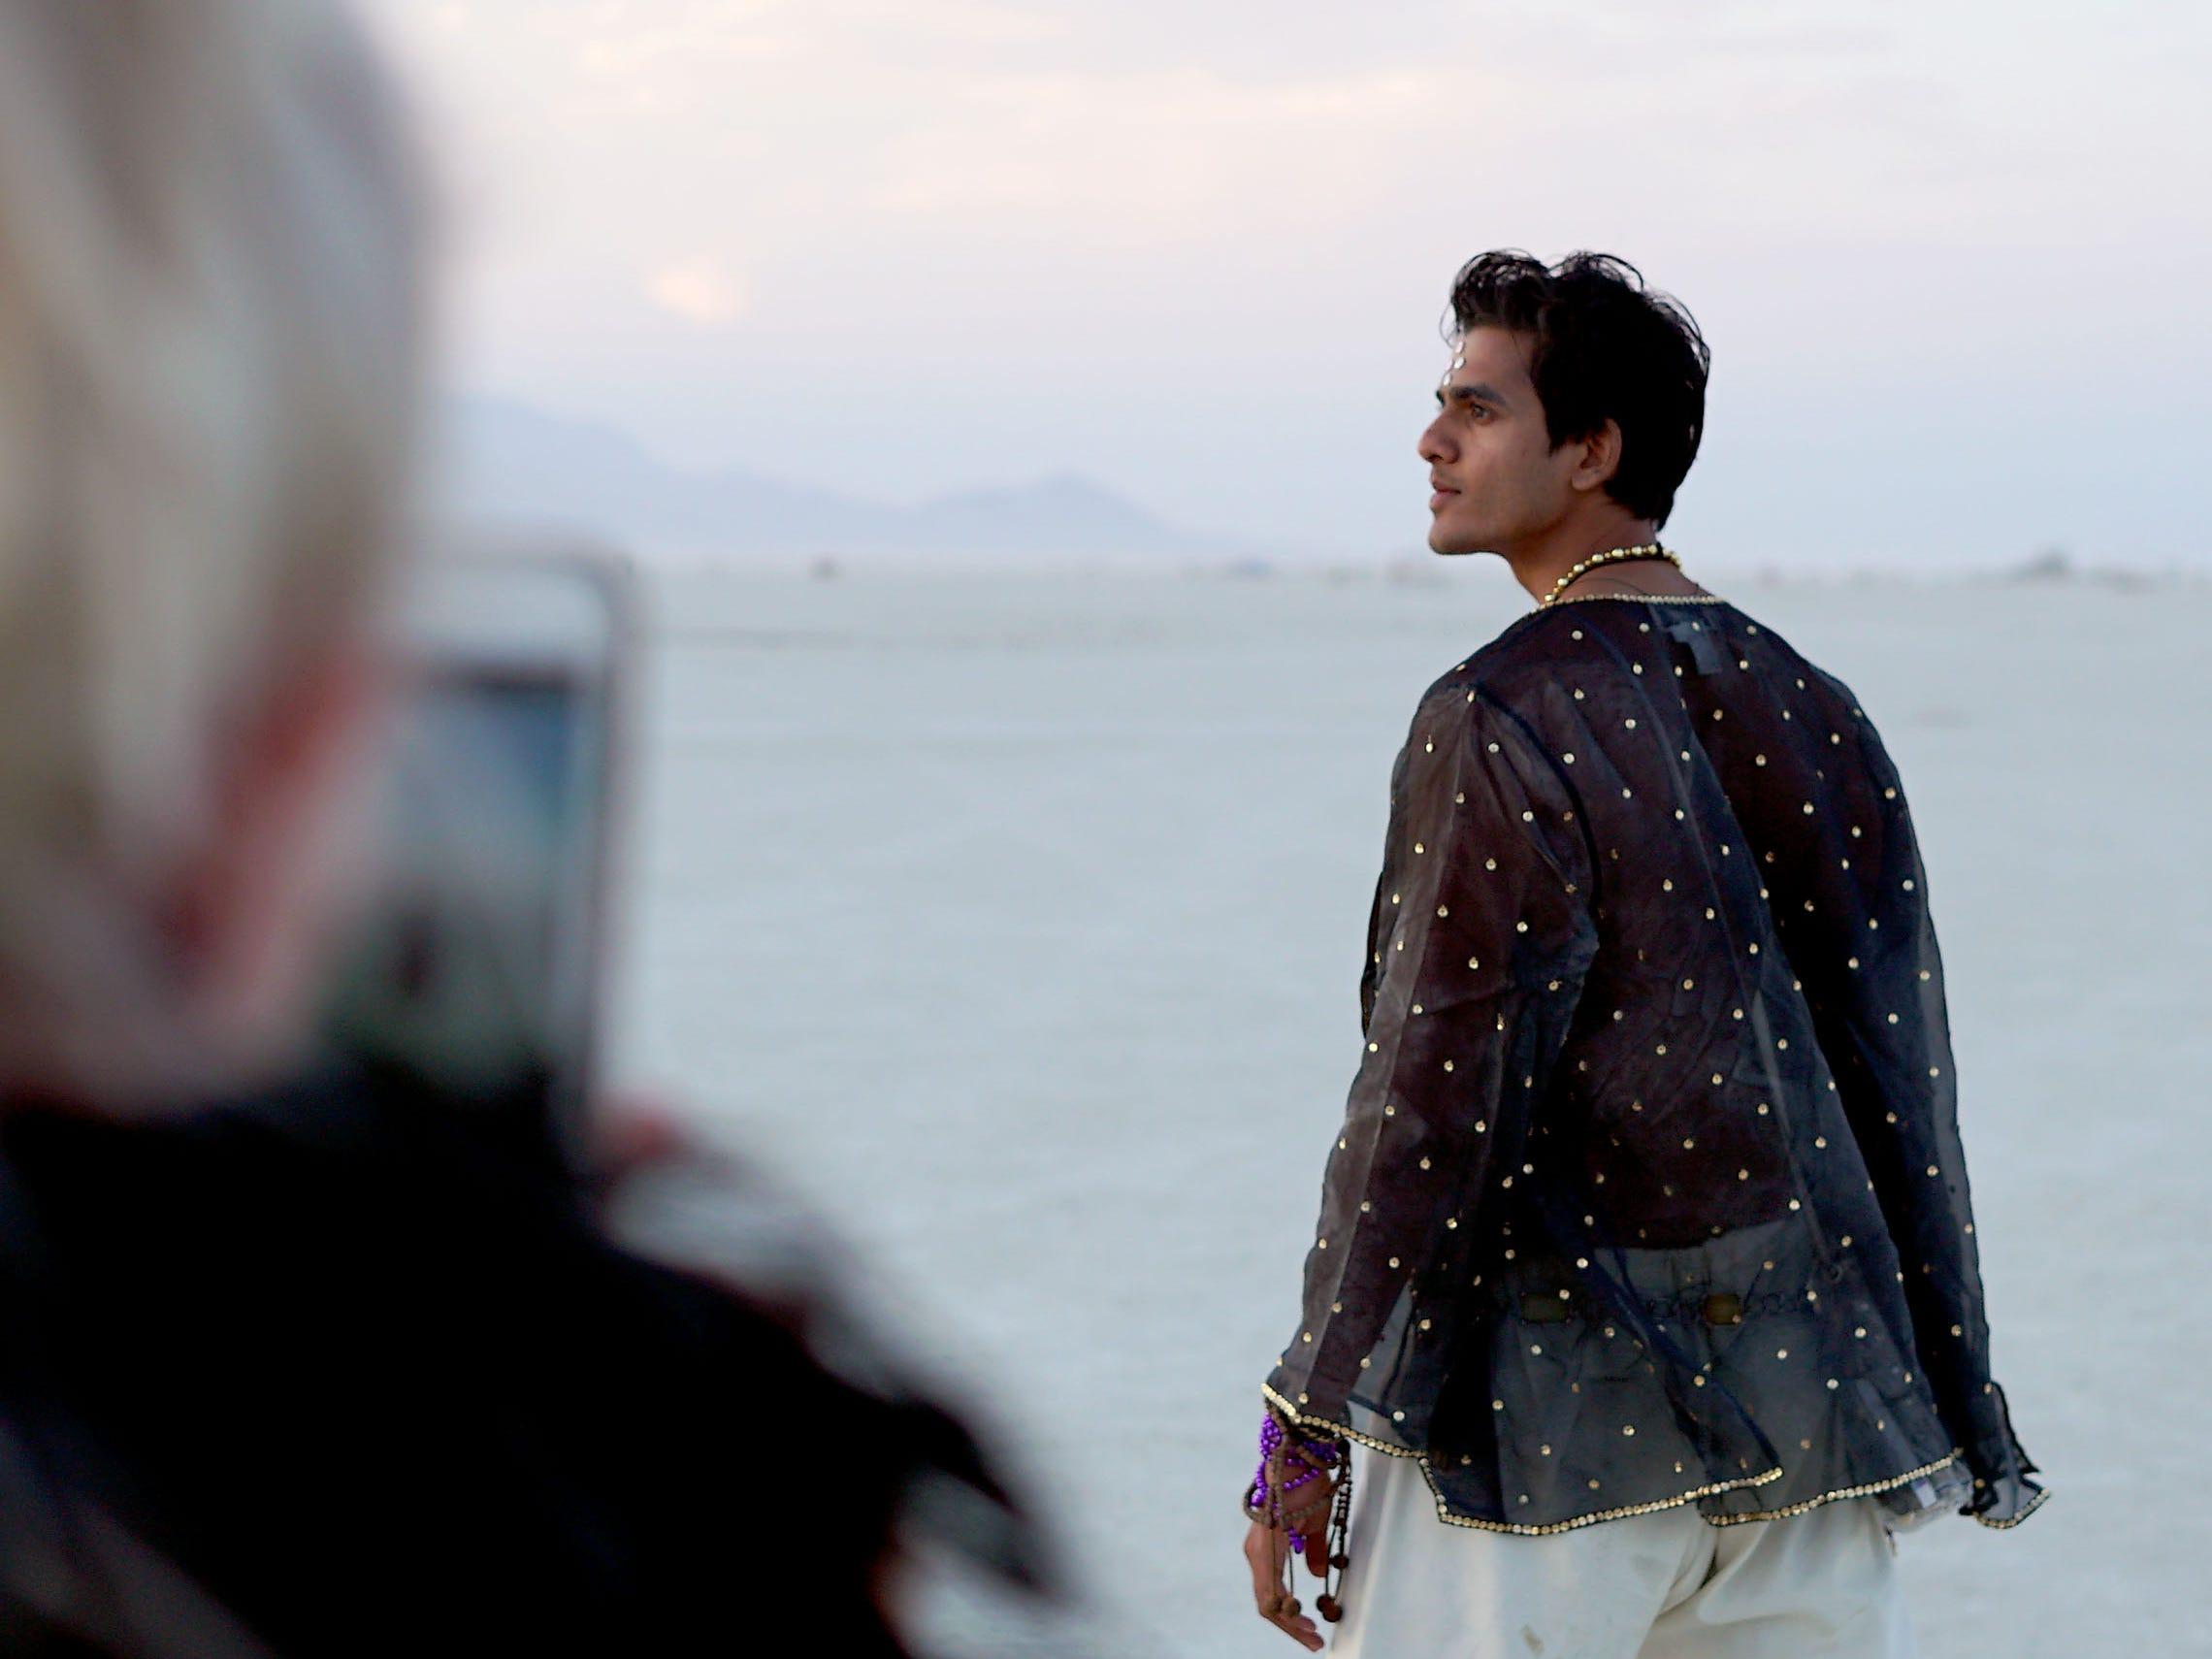 Nirav Nirvana of Los Angeles poses for a photo at Burning Man taken by Helen Sartory of London.